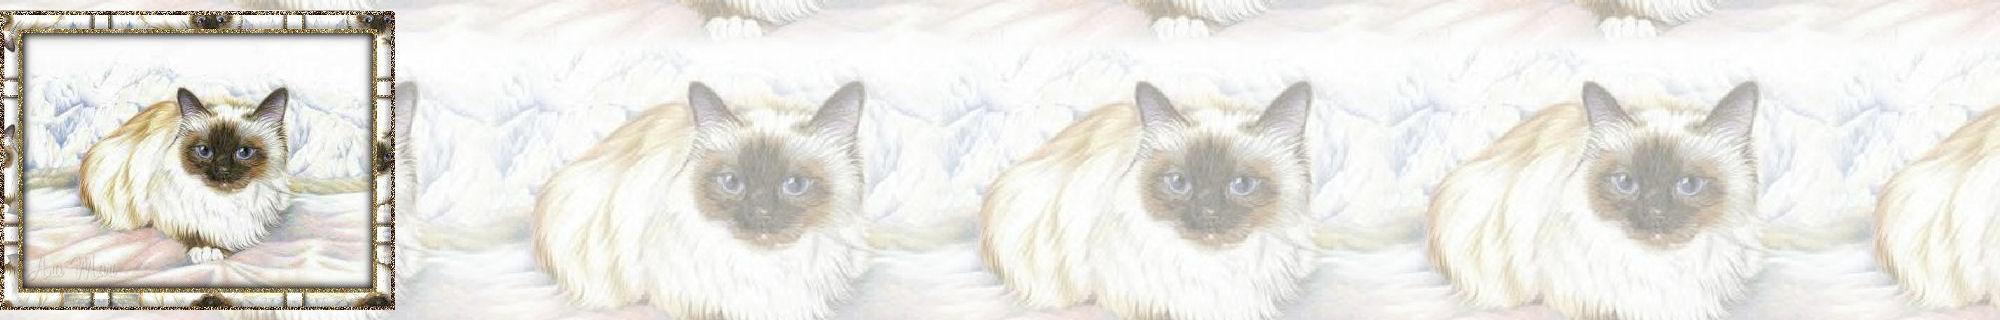 Fondo IM gatos_018.imf